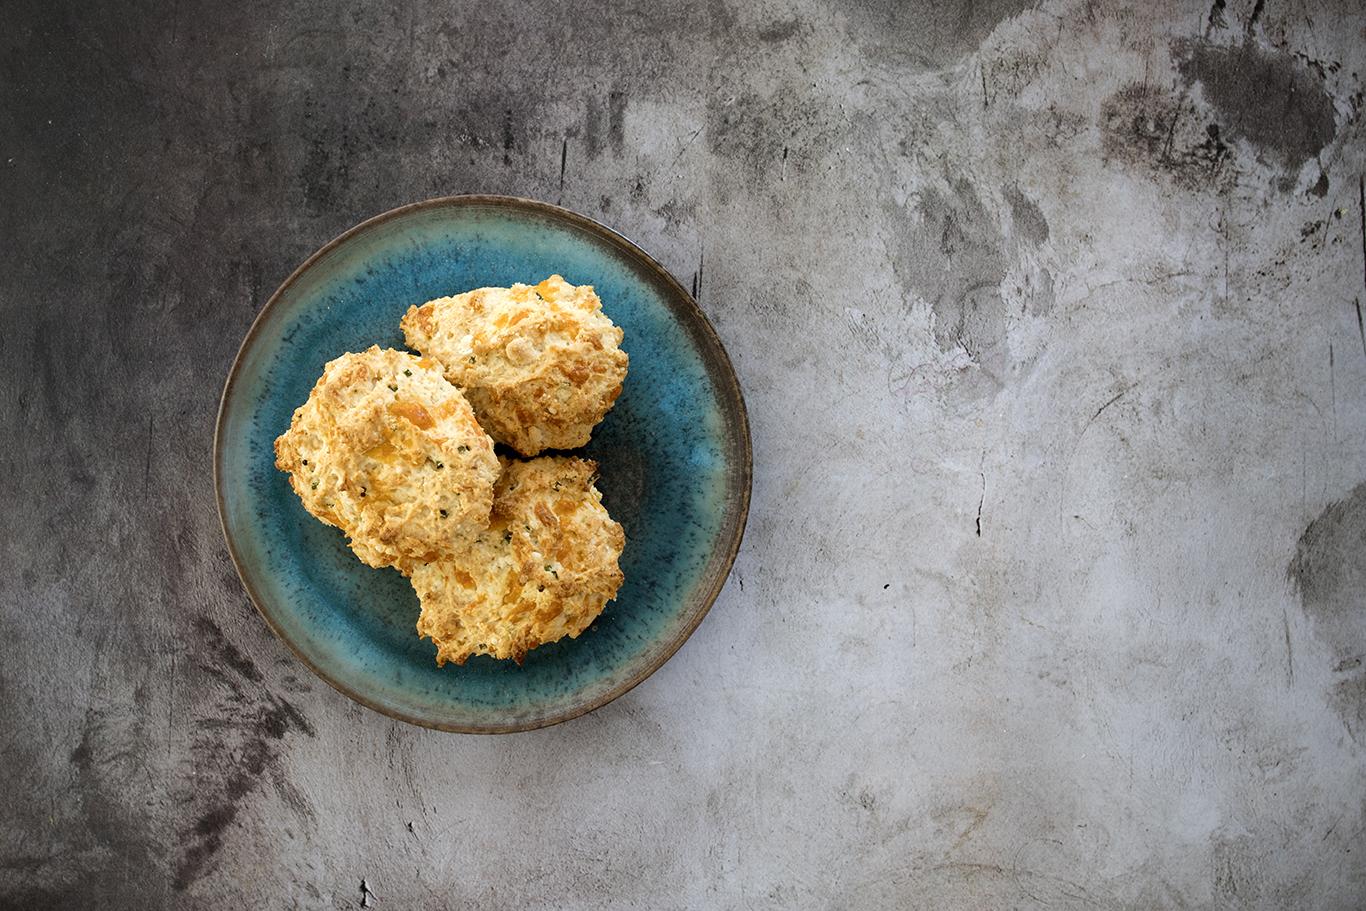 Cheddar-Chive Drop Biscuits Recipe